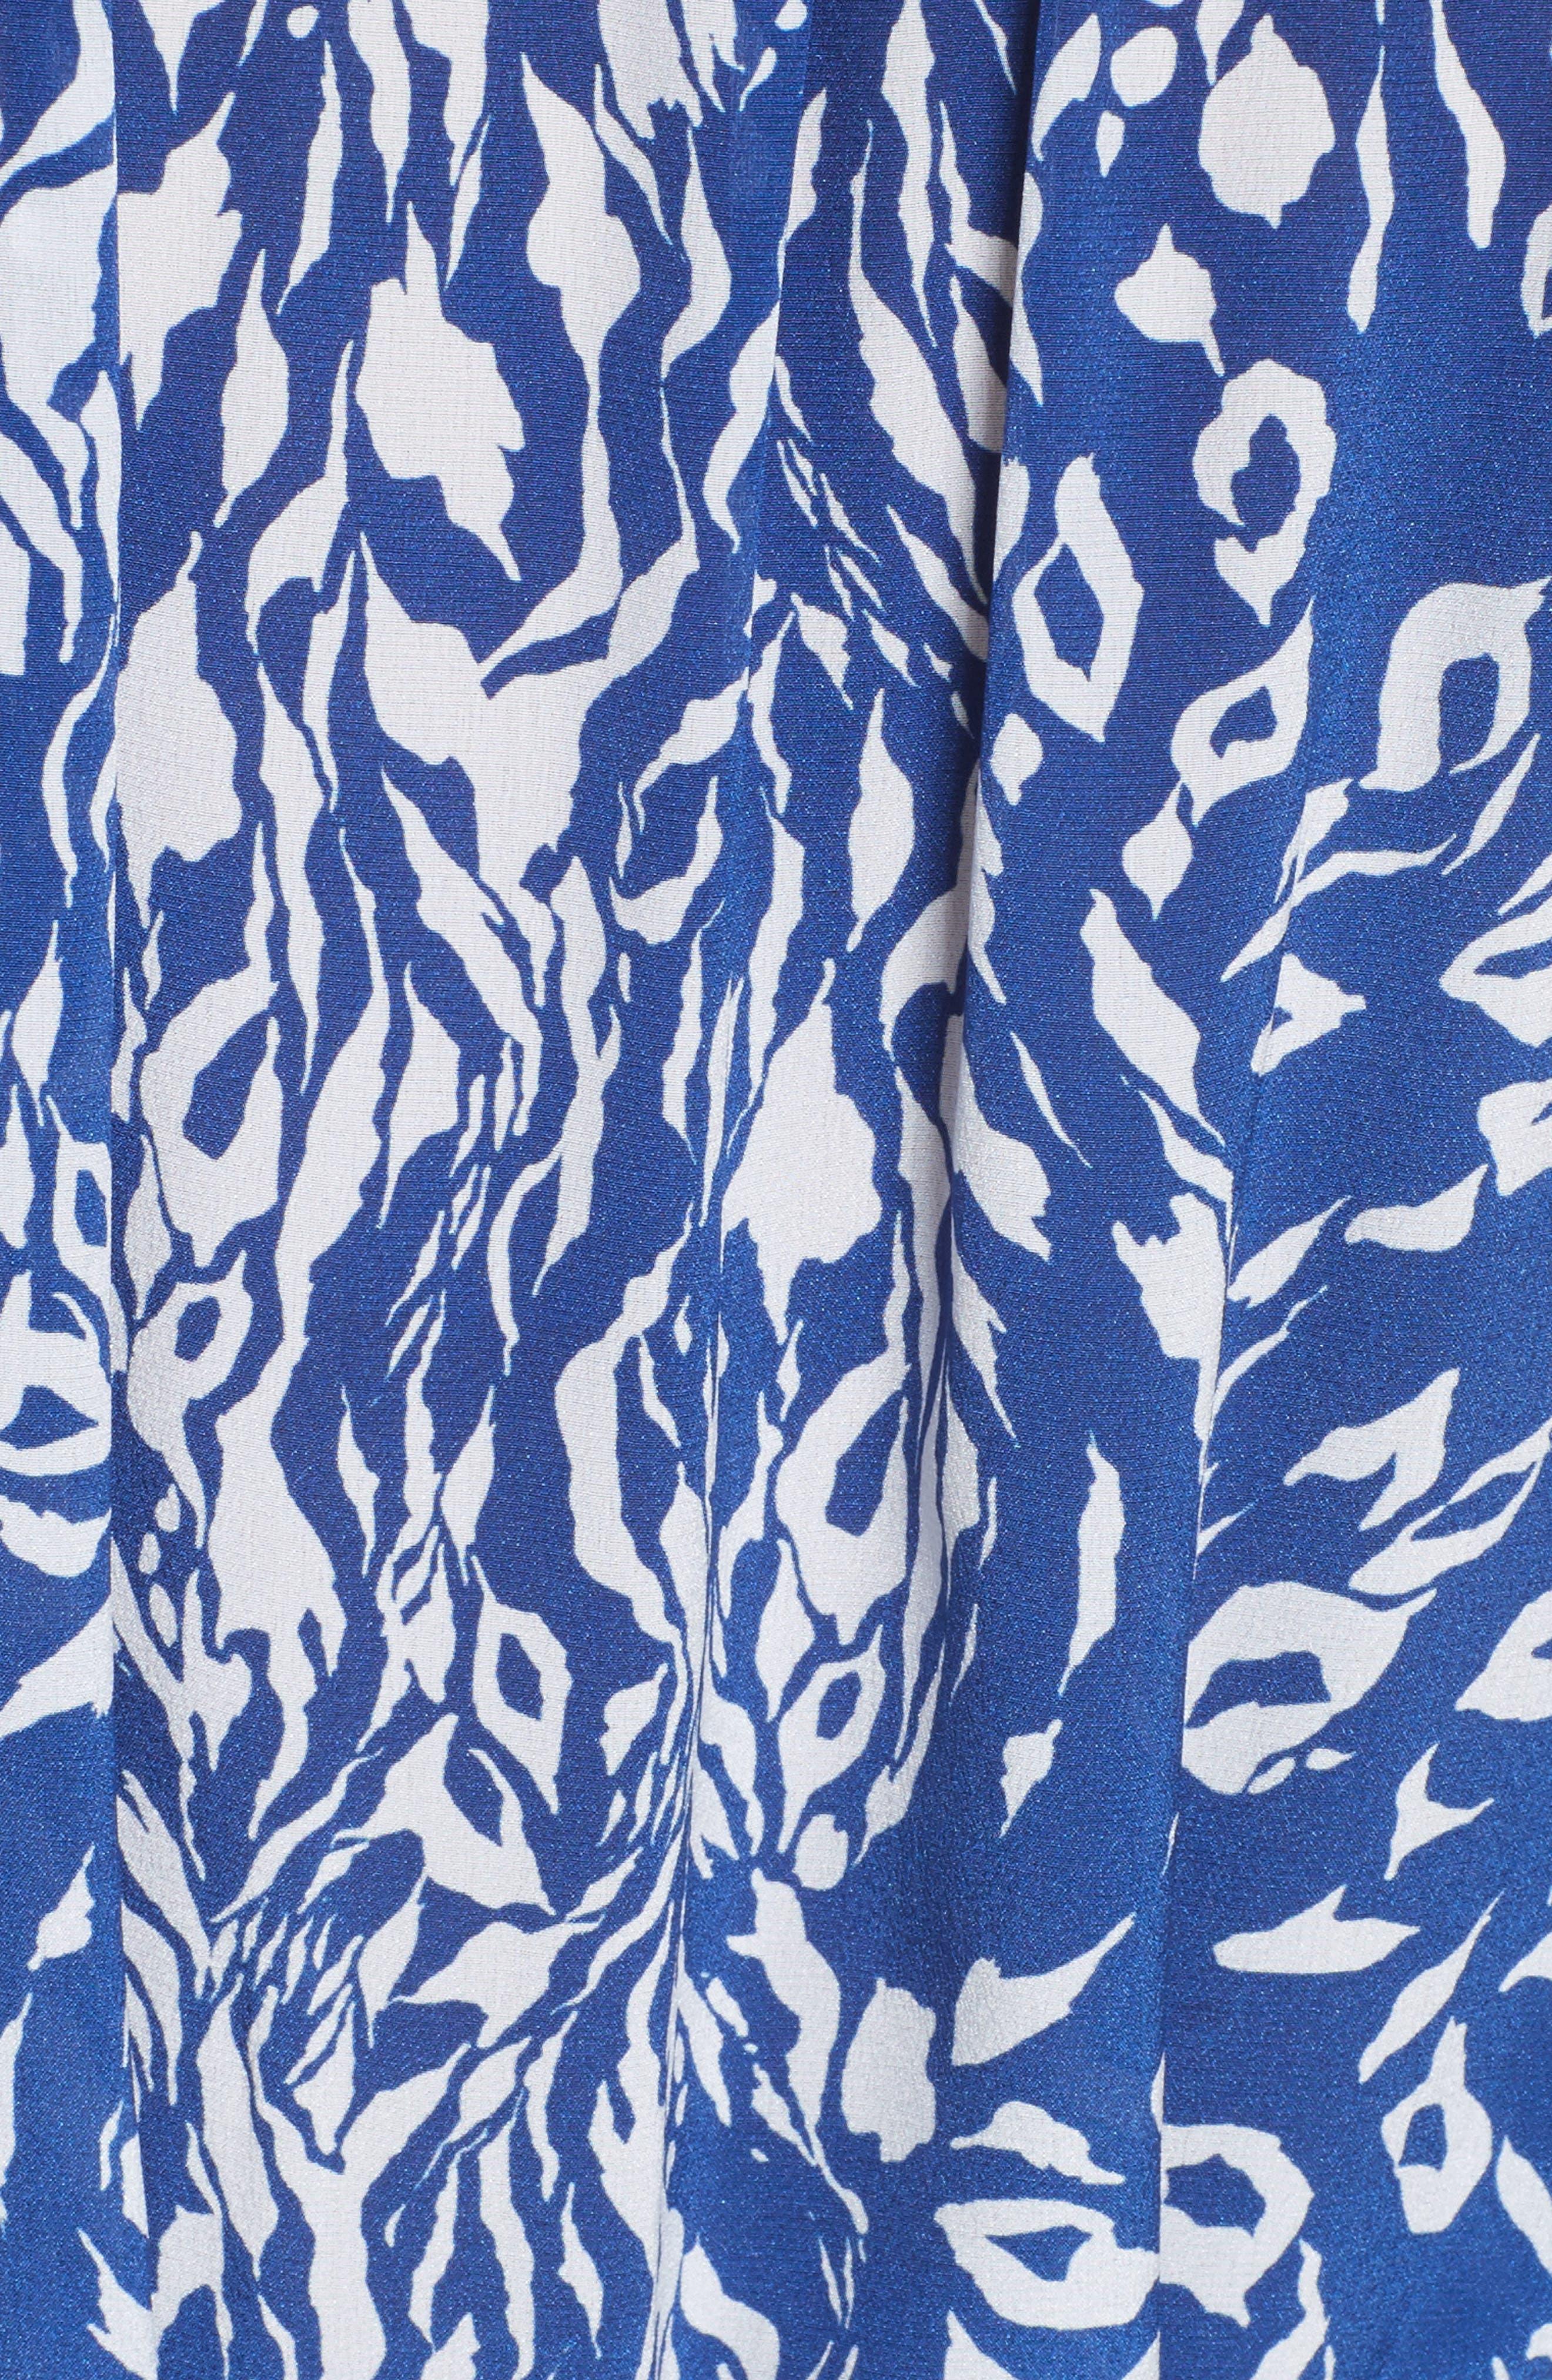 Tilly Print Silk Fit & Flare Dress,                             Alternate thumbnail 6, color,                             416